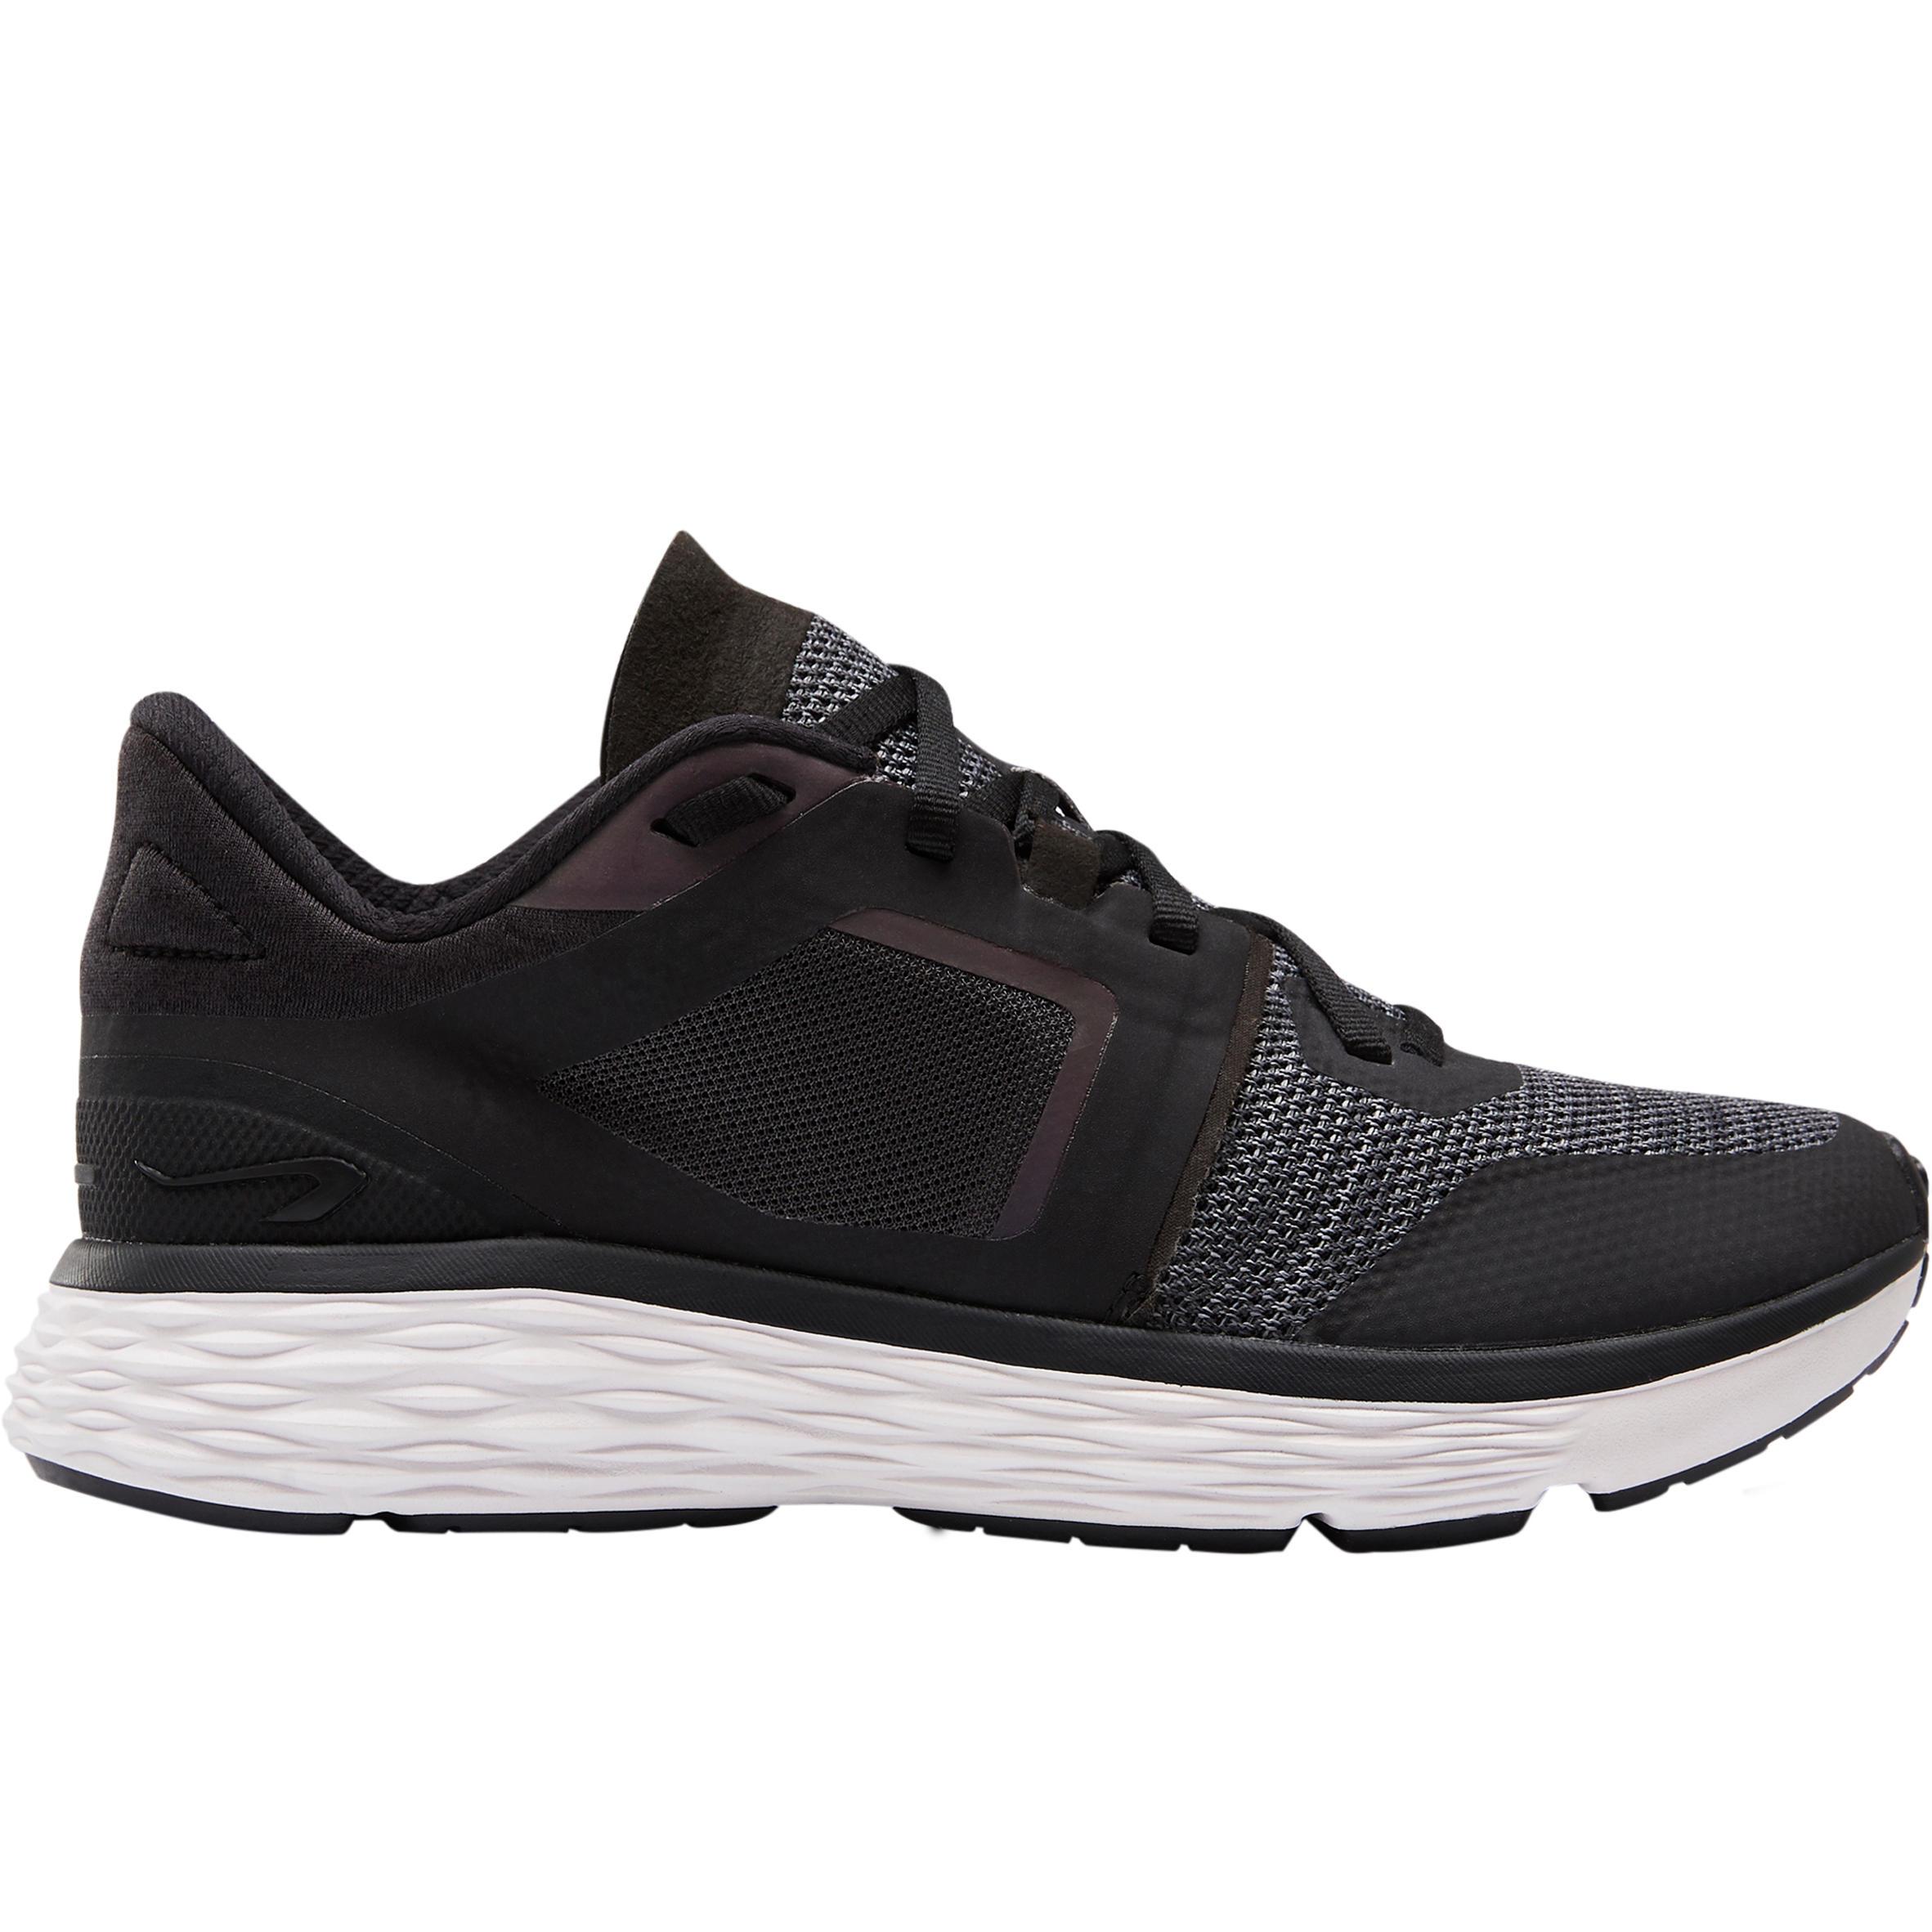 Laufschuhe Run Comfort Damen | Schuhe > Sportschuhe > Laufschuhe | Kalenji